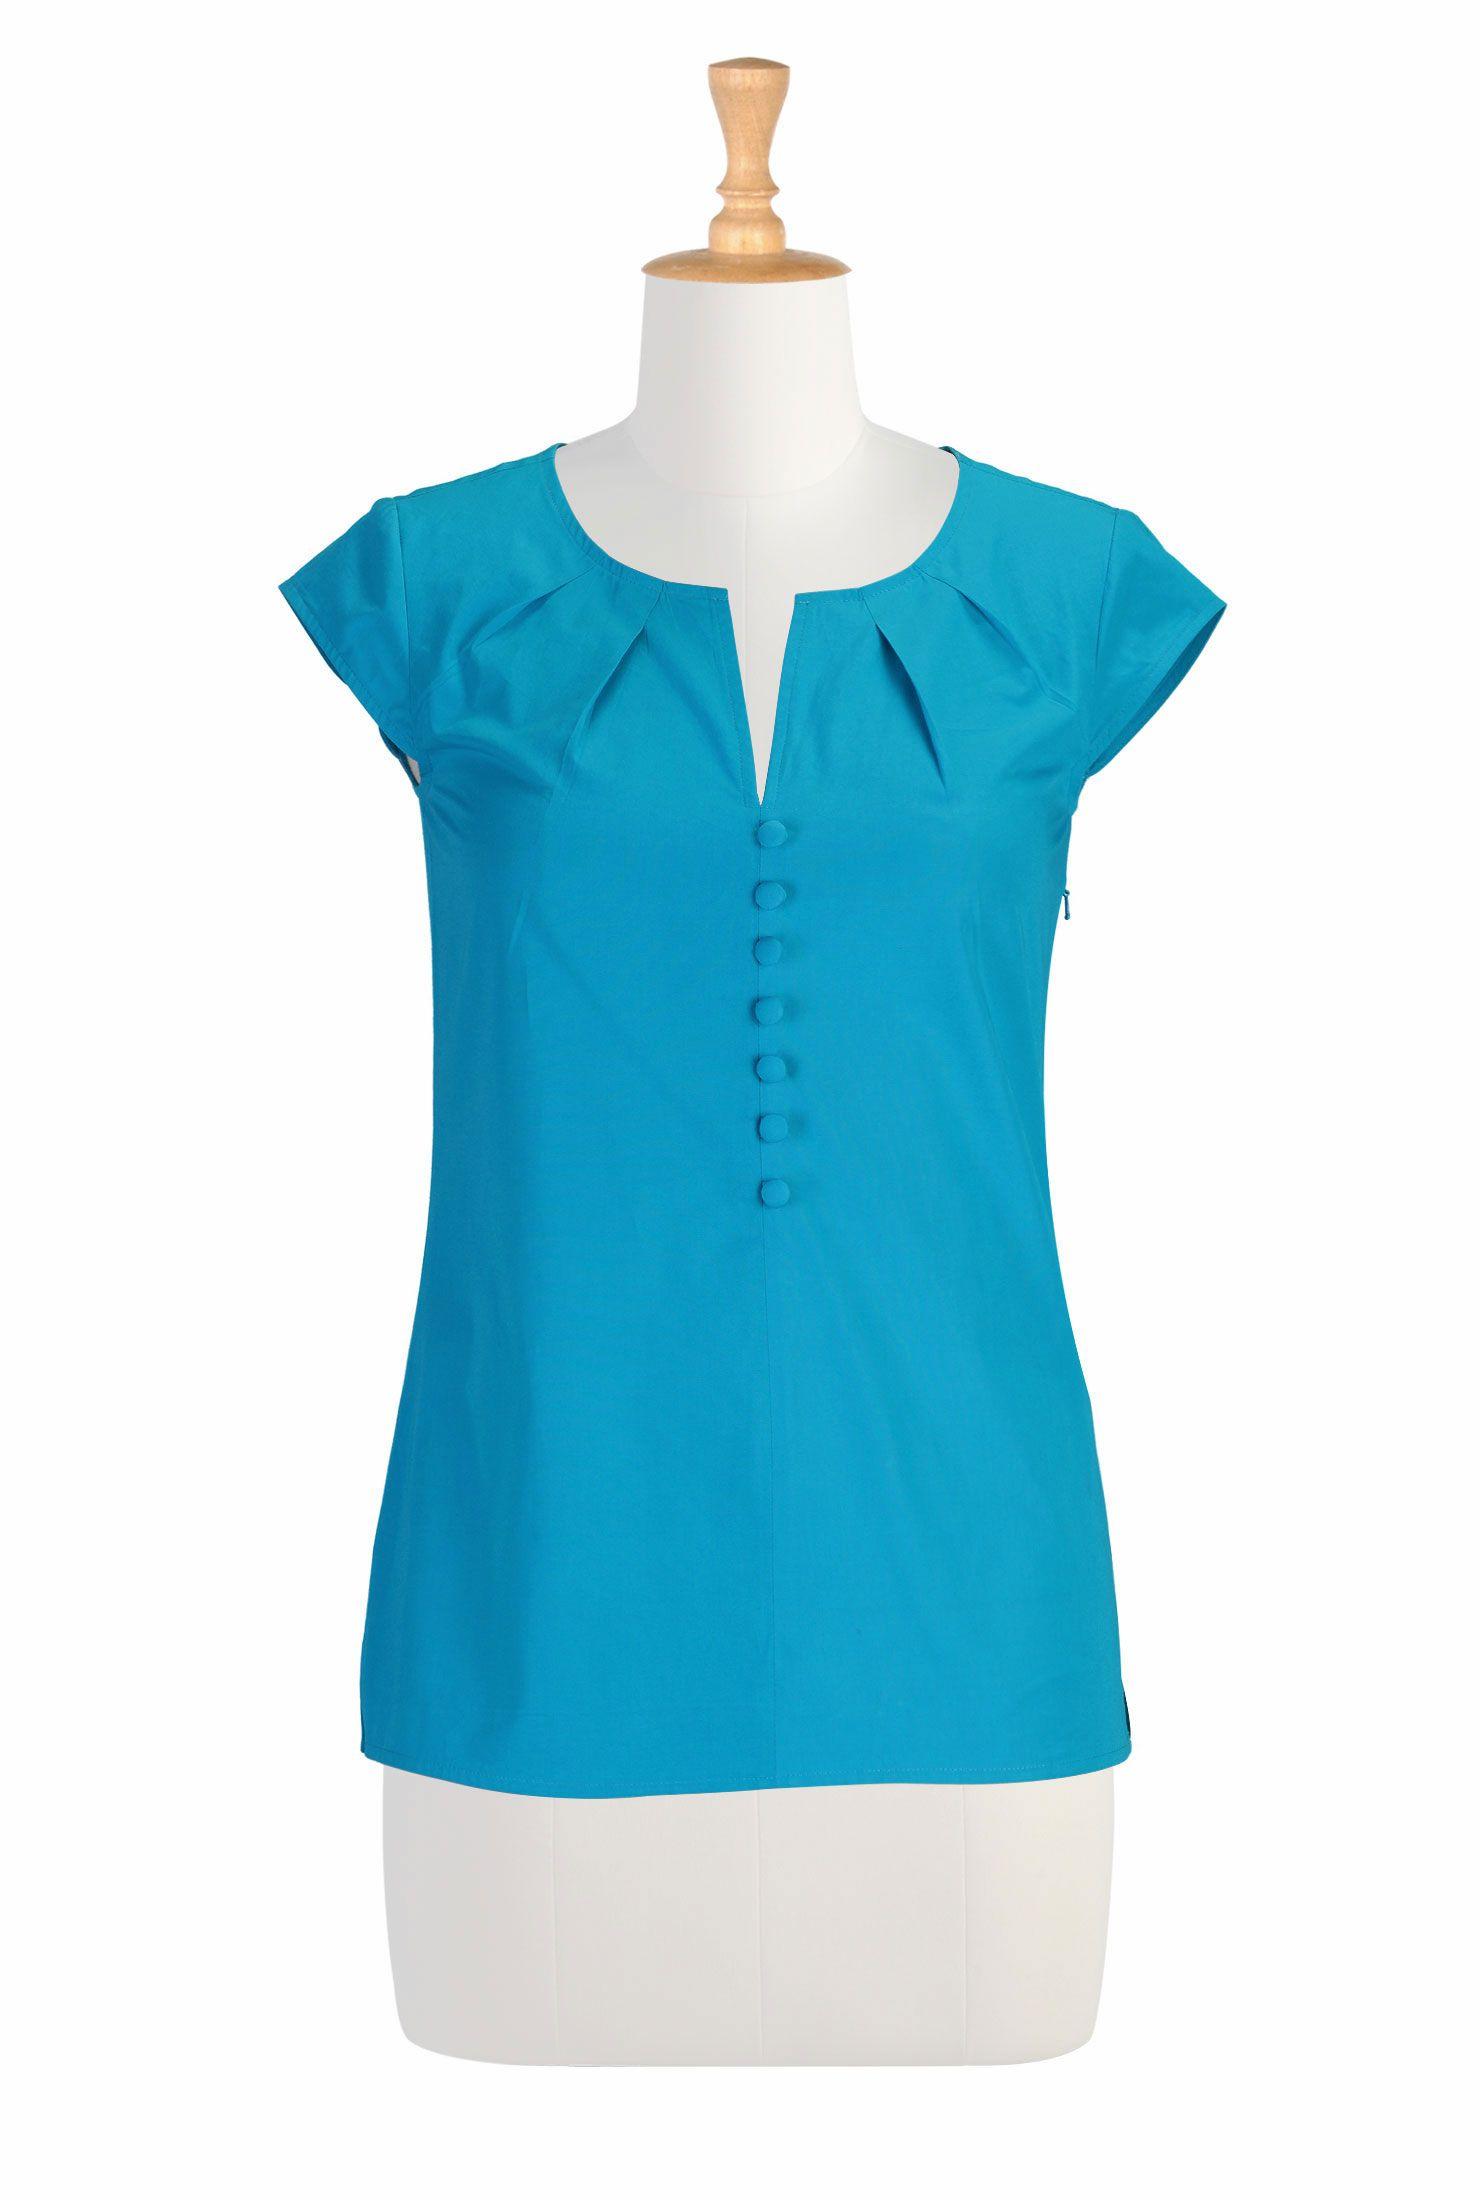 Chateau poplin blouse  Womens dressy blouses, Dressy shirts